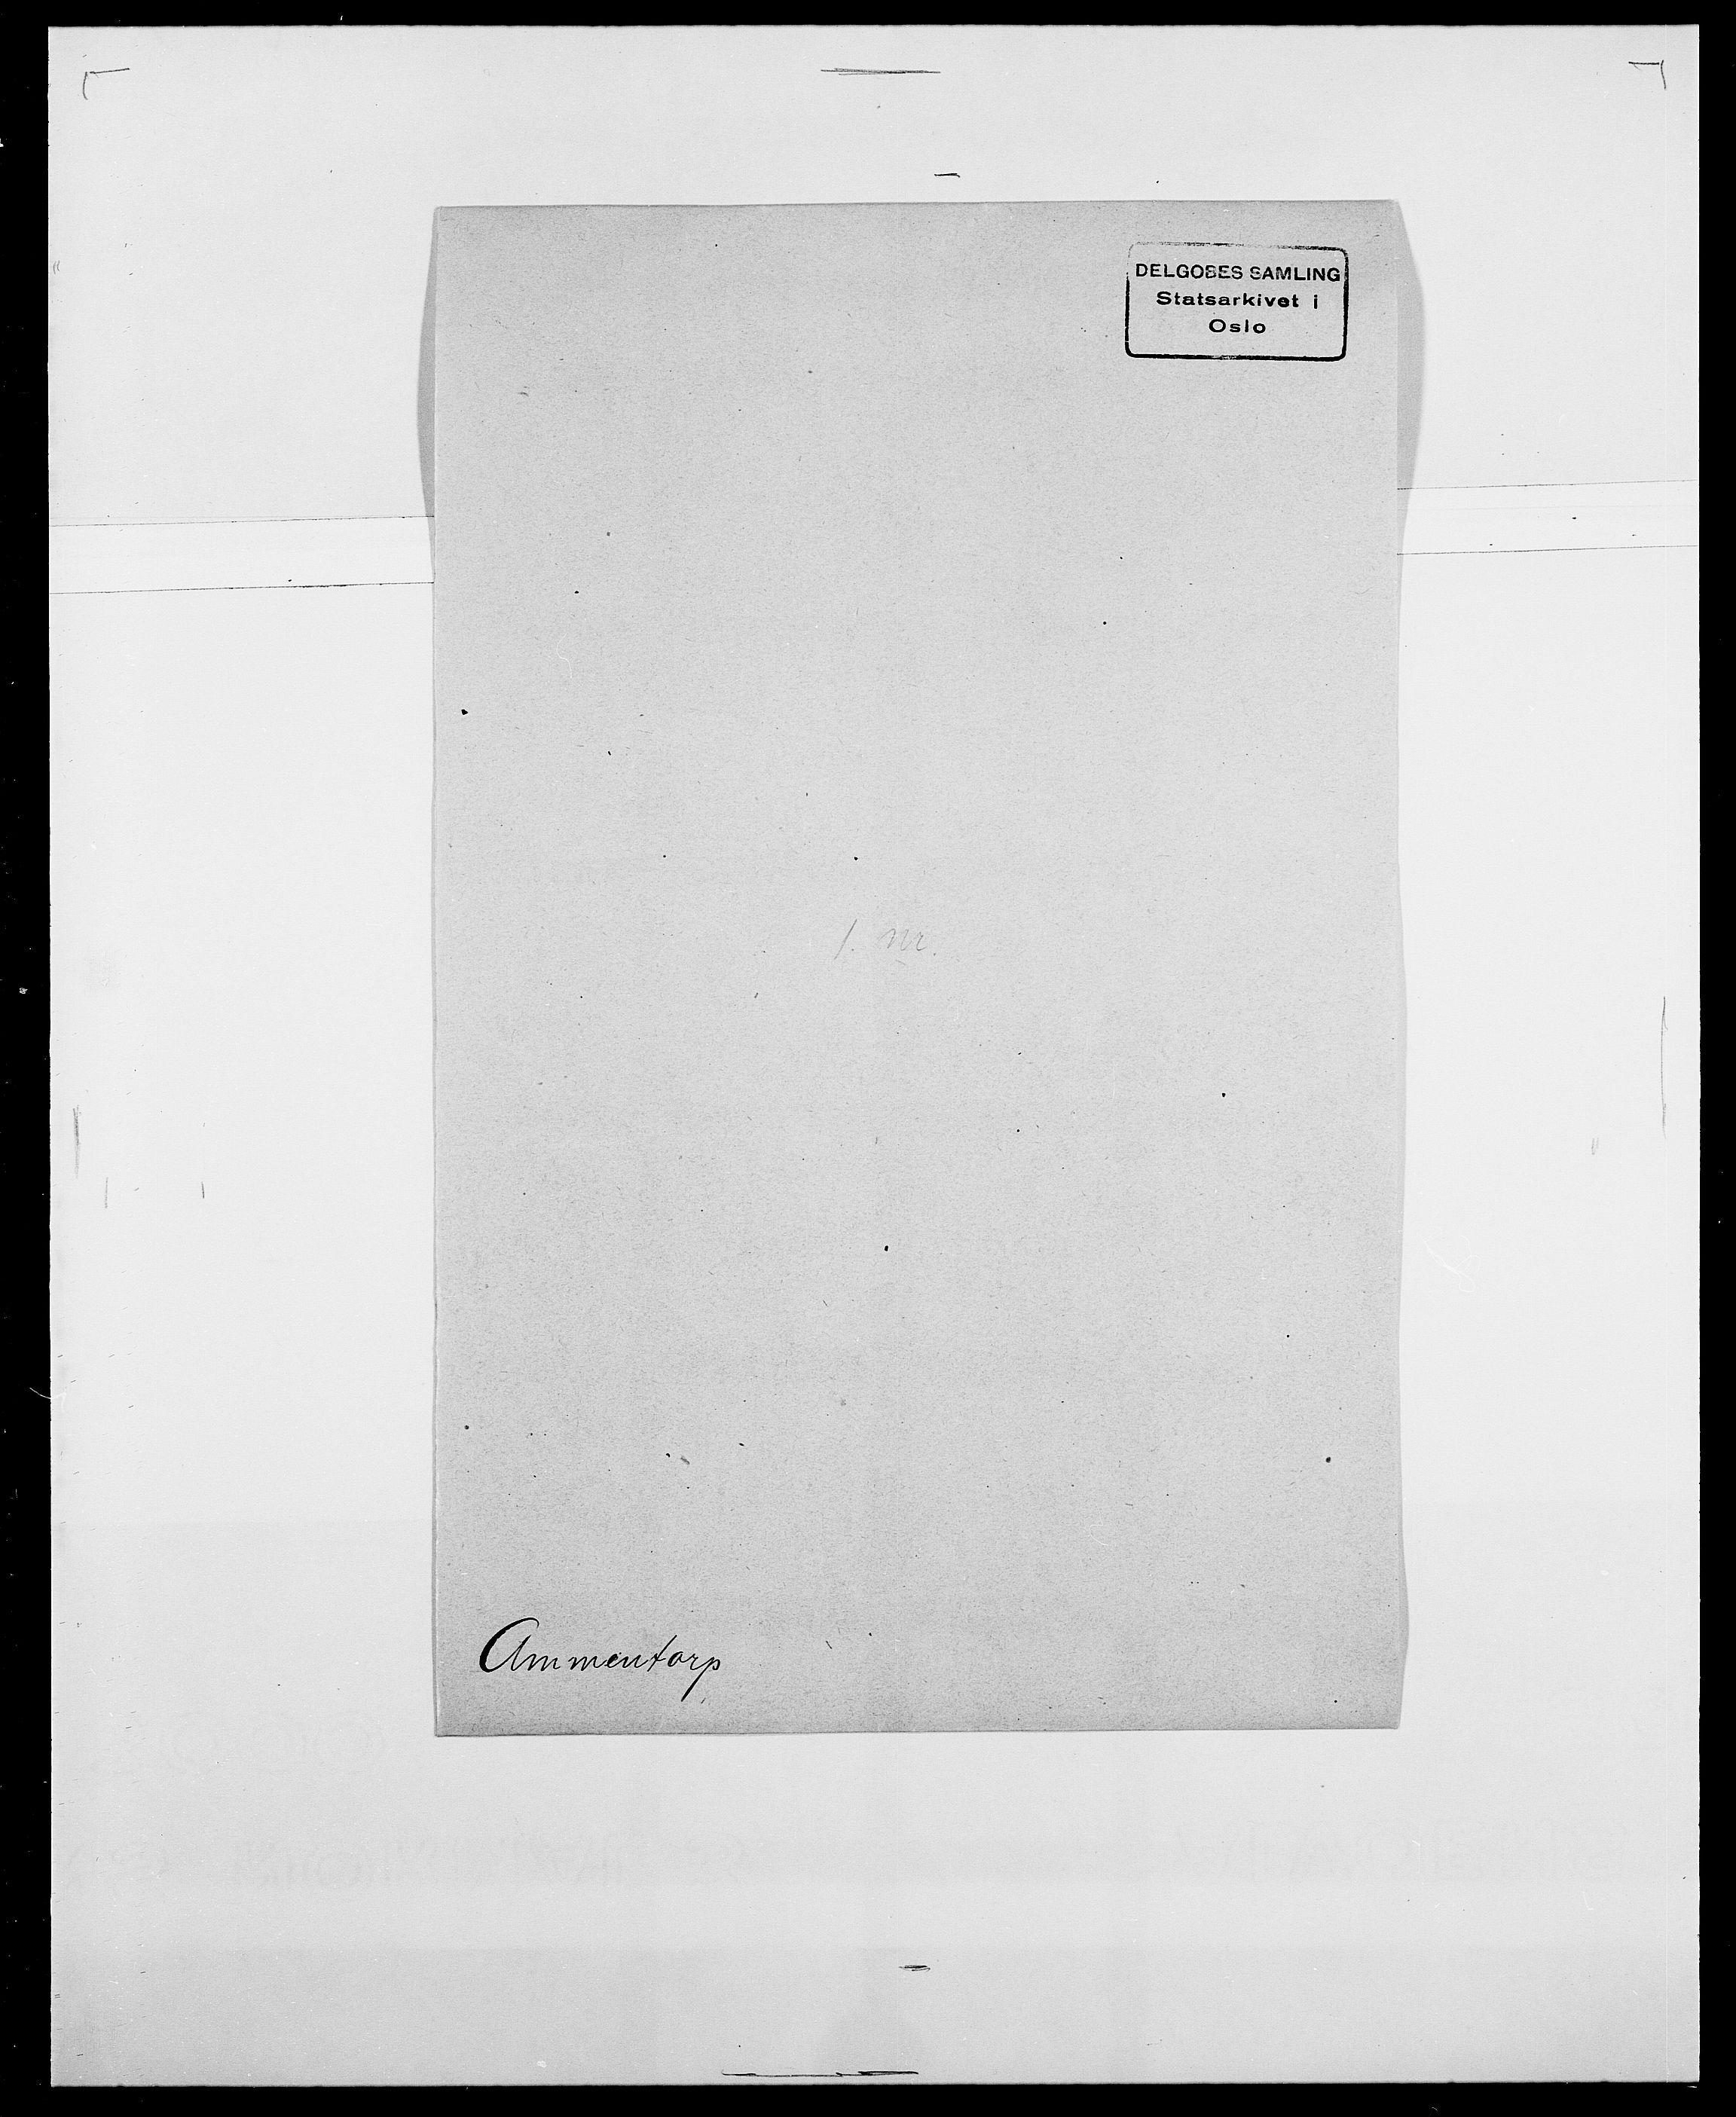 SAO, Delgobe, Charles Antoine - samling, D/Da/L0001: Aabye - Angerman, s. 545